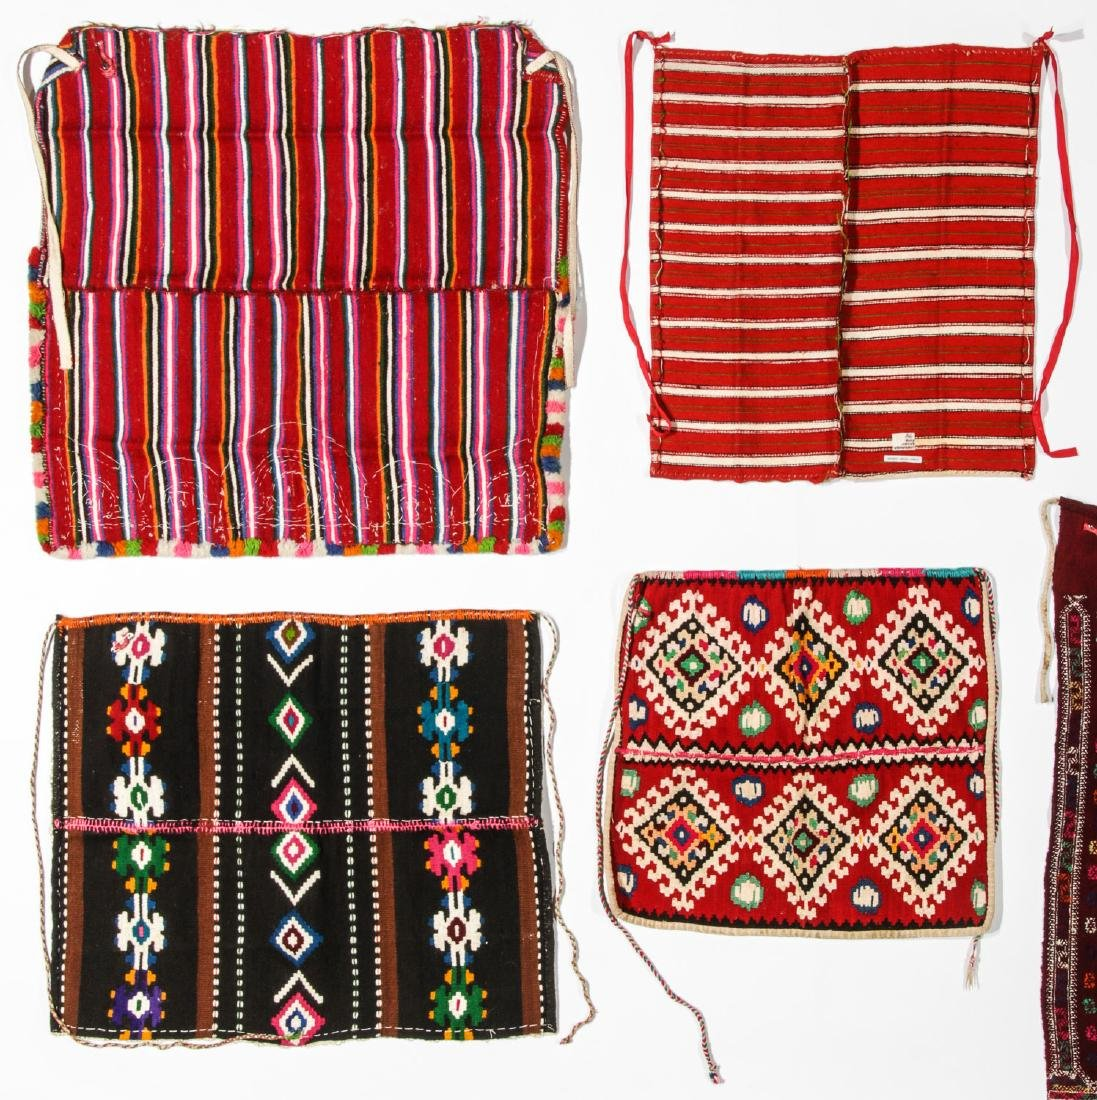 8 Vintage Handwoven Balkan/Turkish Aprons/Textiles - 5